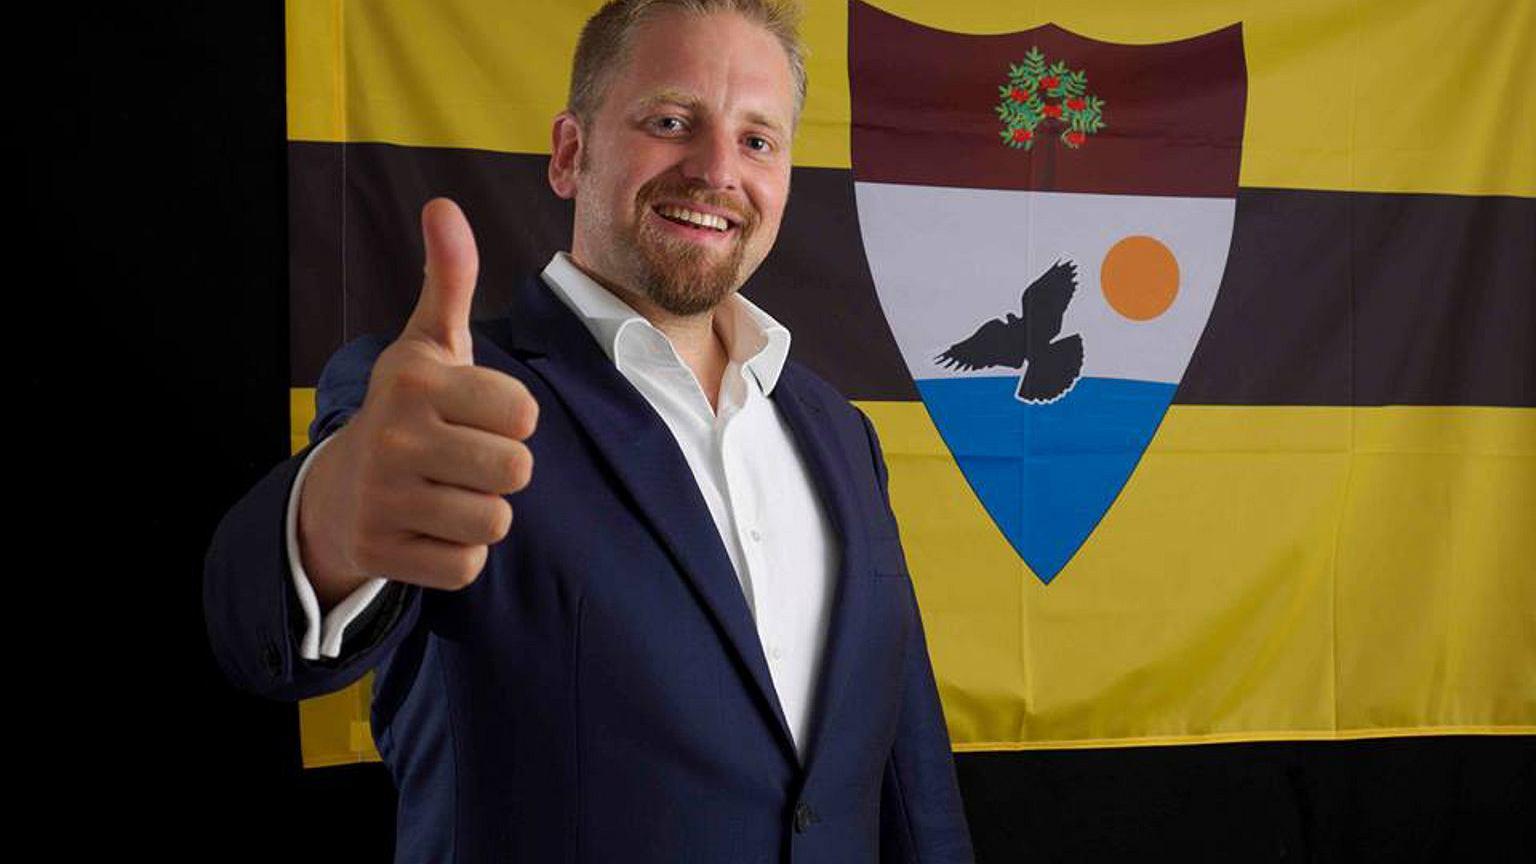 Prezydent Liberlandu - Vit Jedlicka